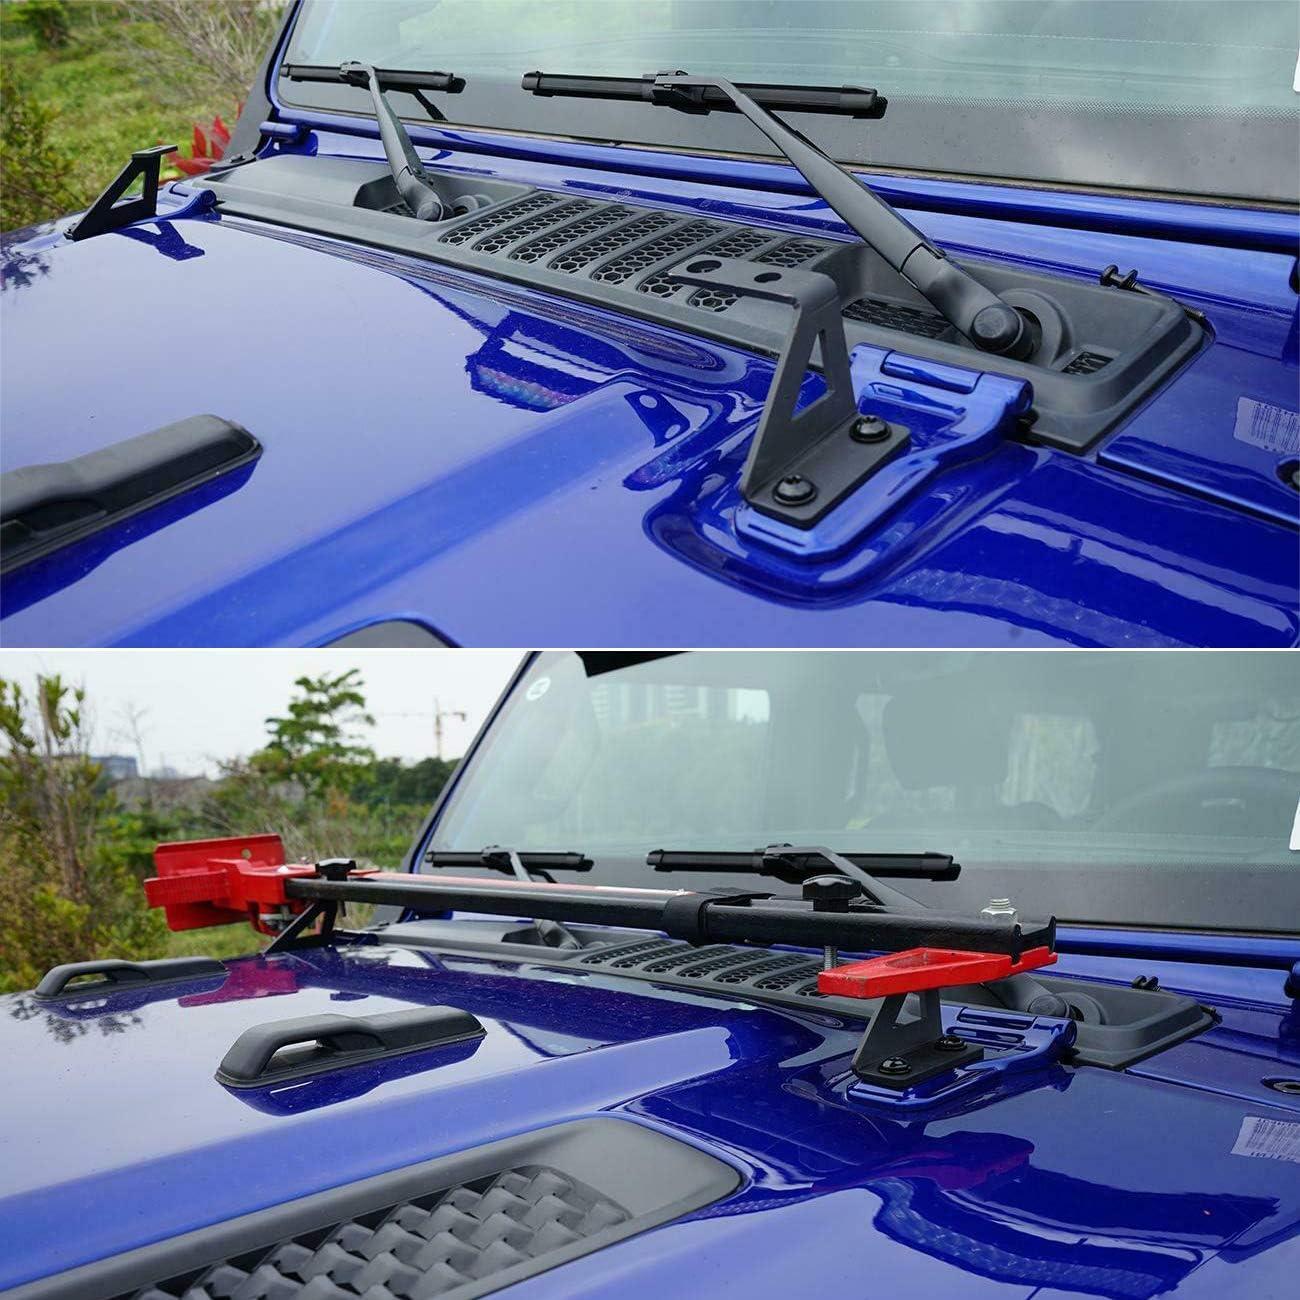 HEQIANG Hi Lift Jack Mount Hood Door Hinge Brackets Kit for Jeep Wrangler JK 2007-2017 JL 2018 2019 2020 Up